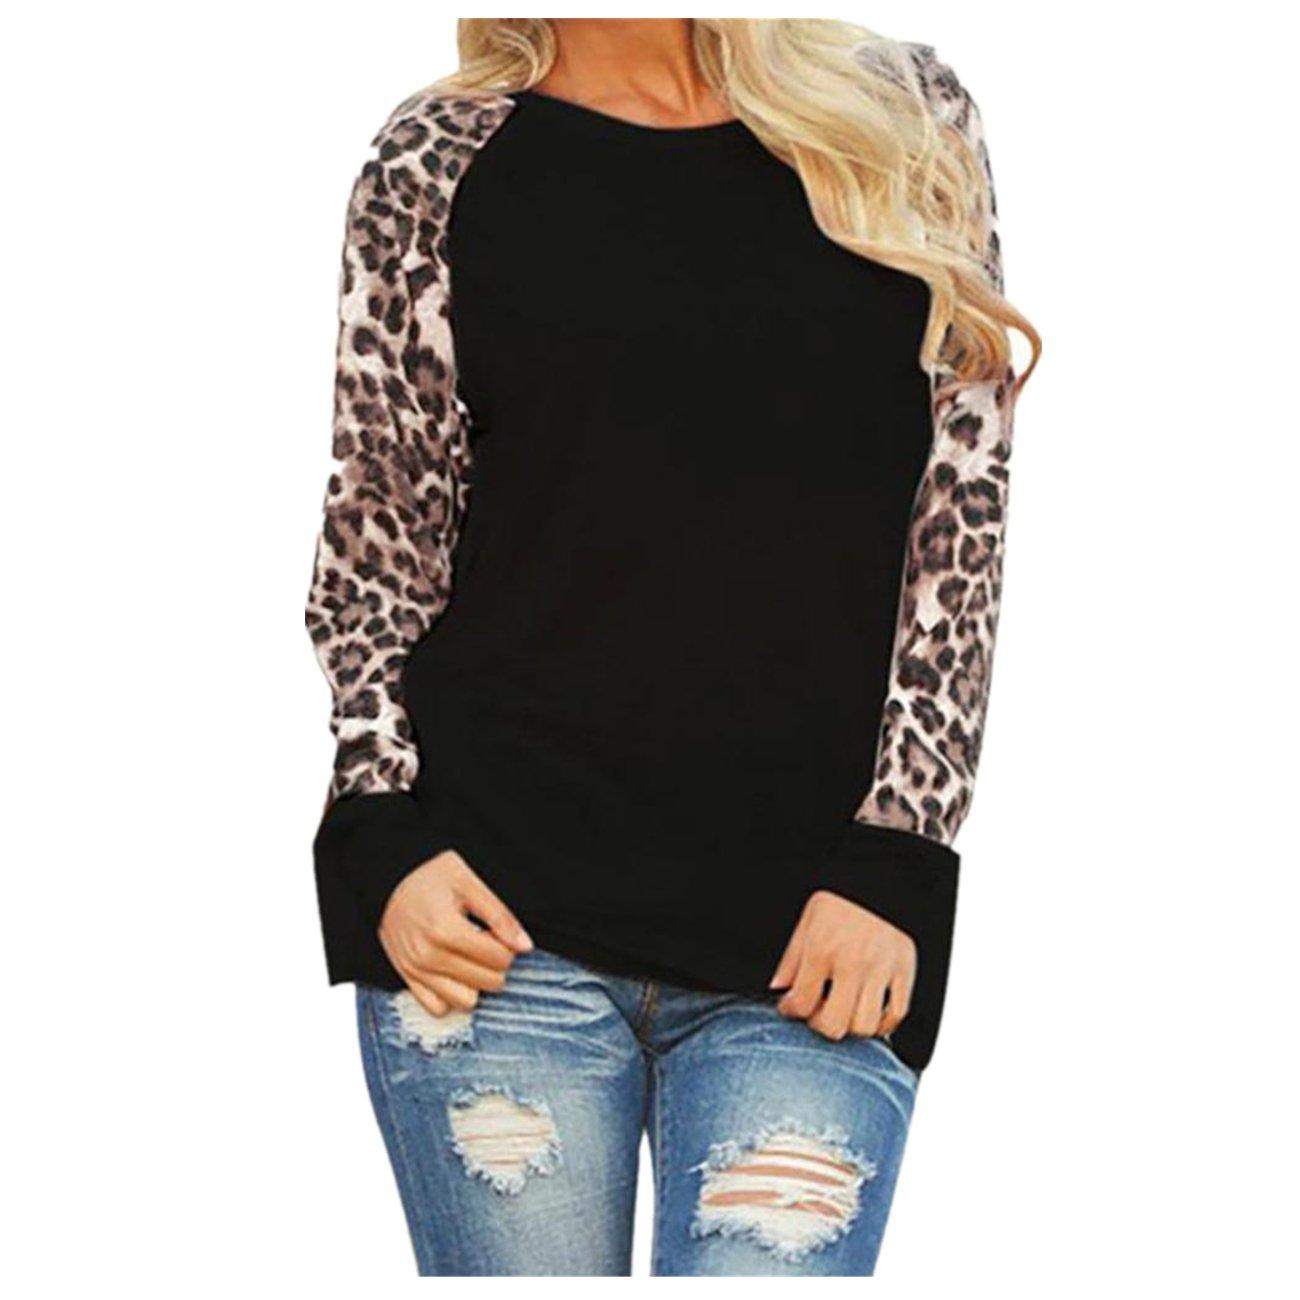 TIFENNY Fashion Womens Long Sleeve T-Shirt, Ladies Plus Size Leopard Blouse Oversize Tops(Gray,M) (XXXXXL, Black)